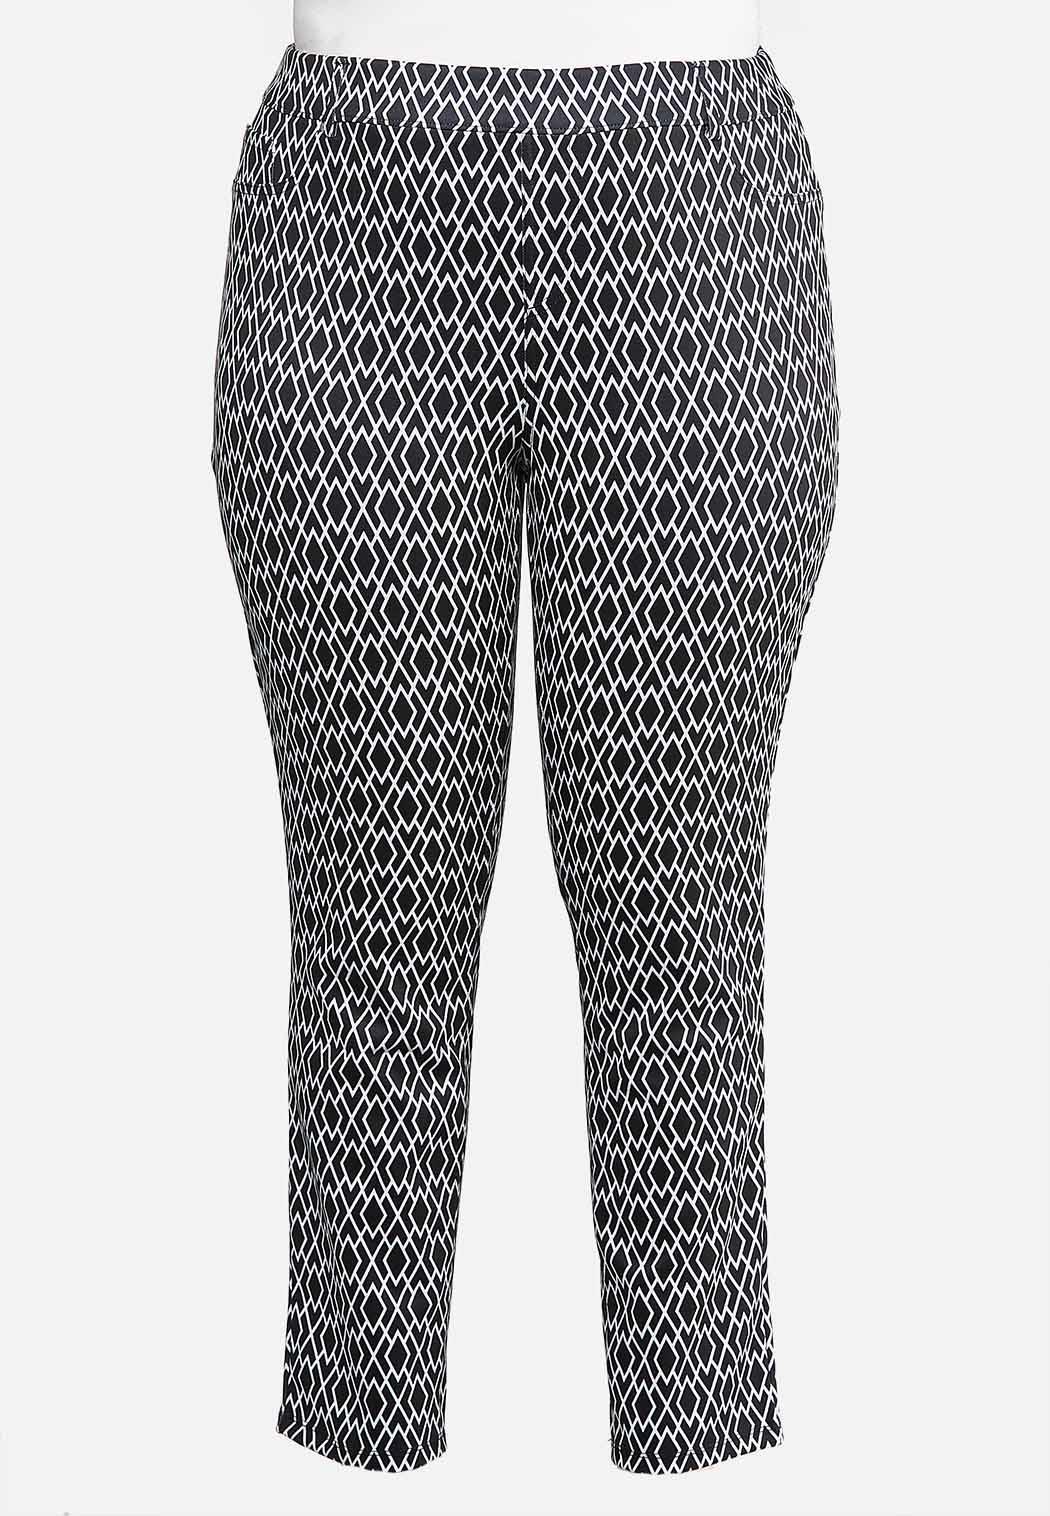 8036fe5c9be572 Women's Plus Size Pants